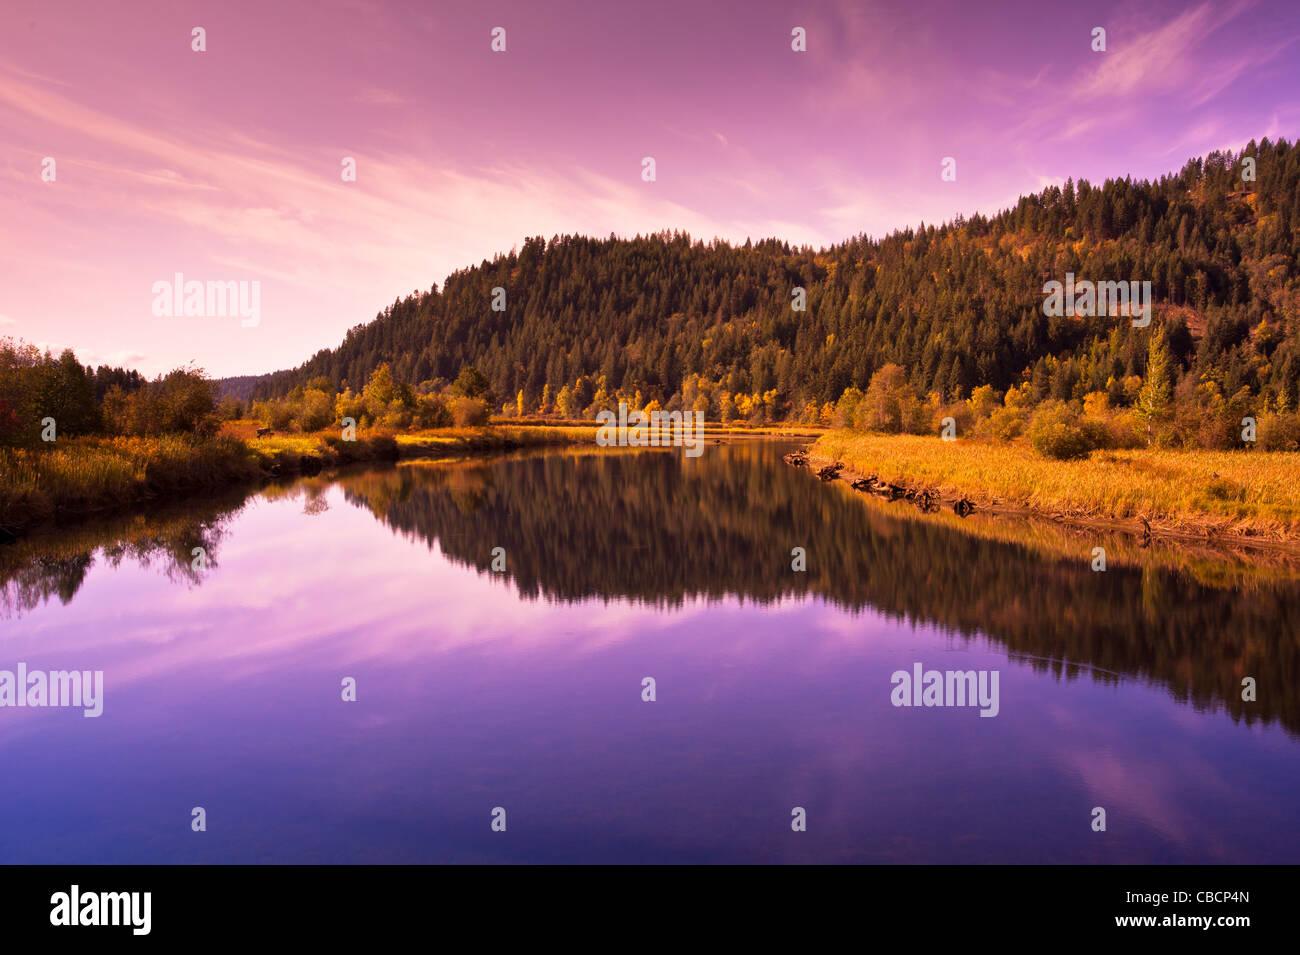 Idaho Panhandle Stock Photos & Idaho Panhandle Stock Images - Alamy